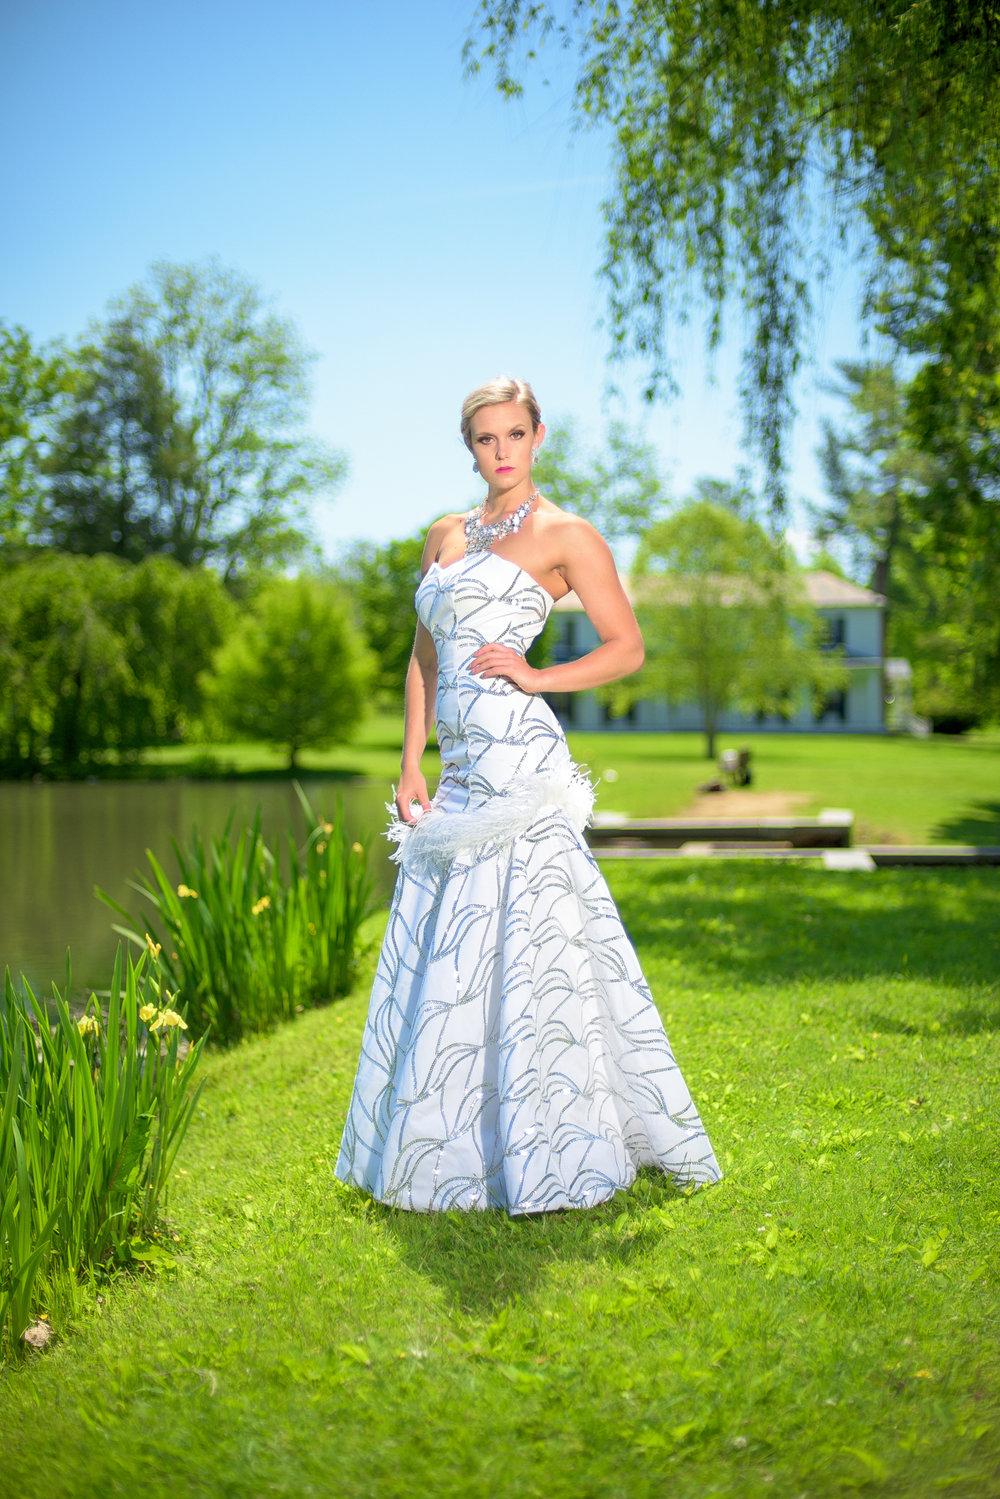 White_Dress-84694.jpg